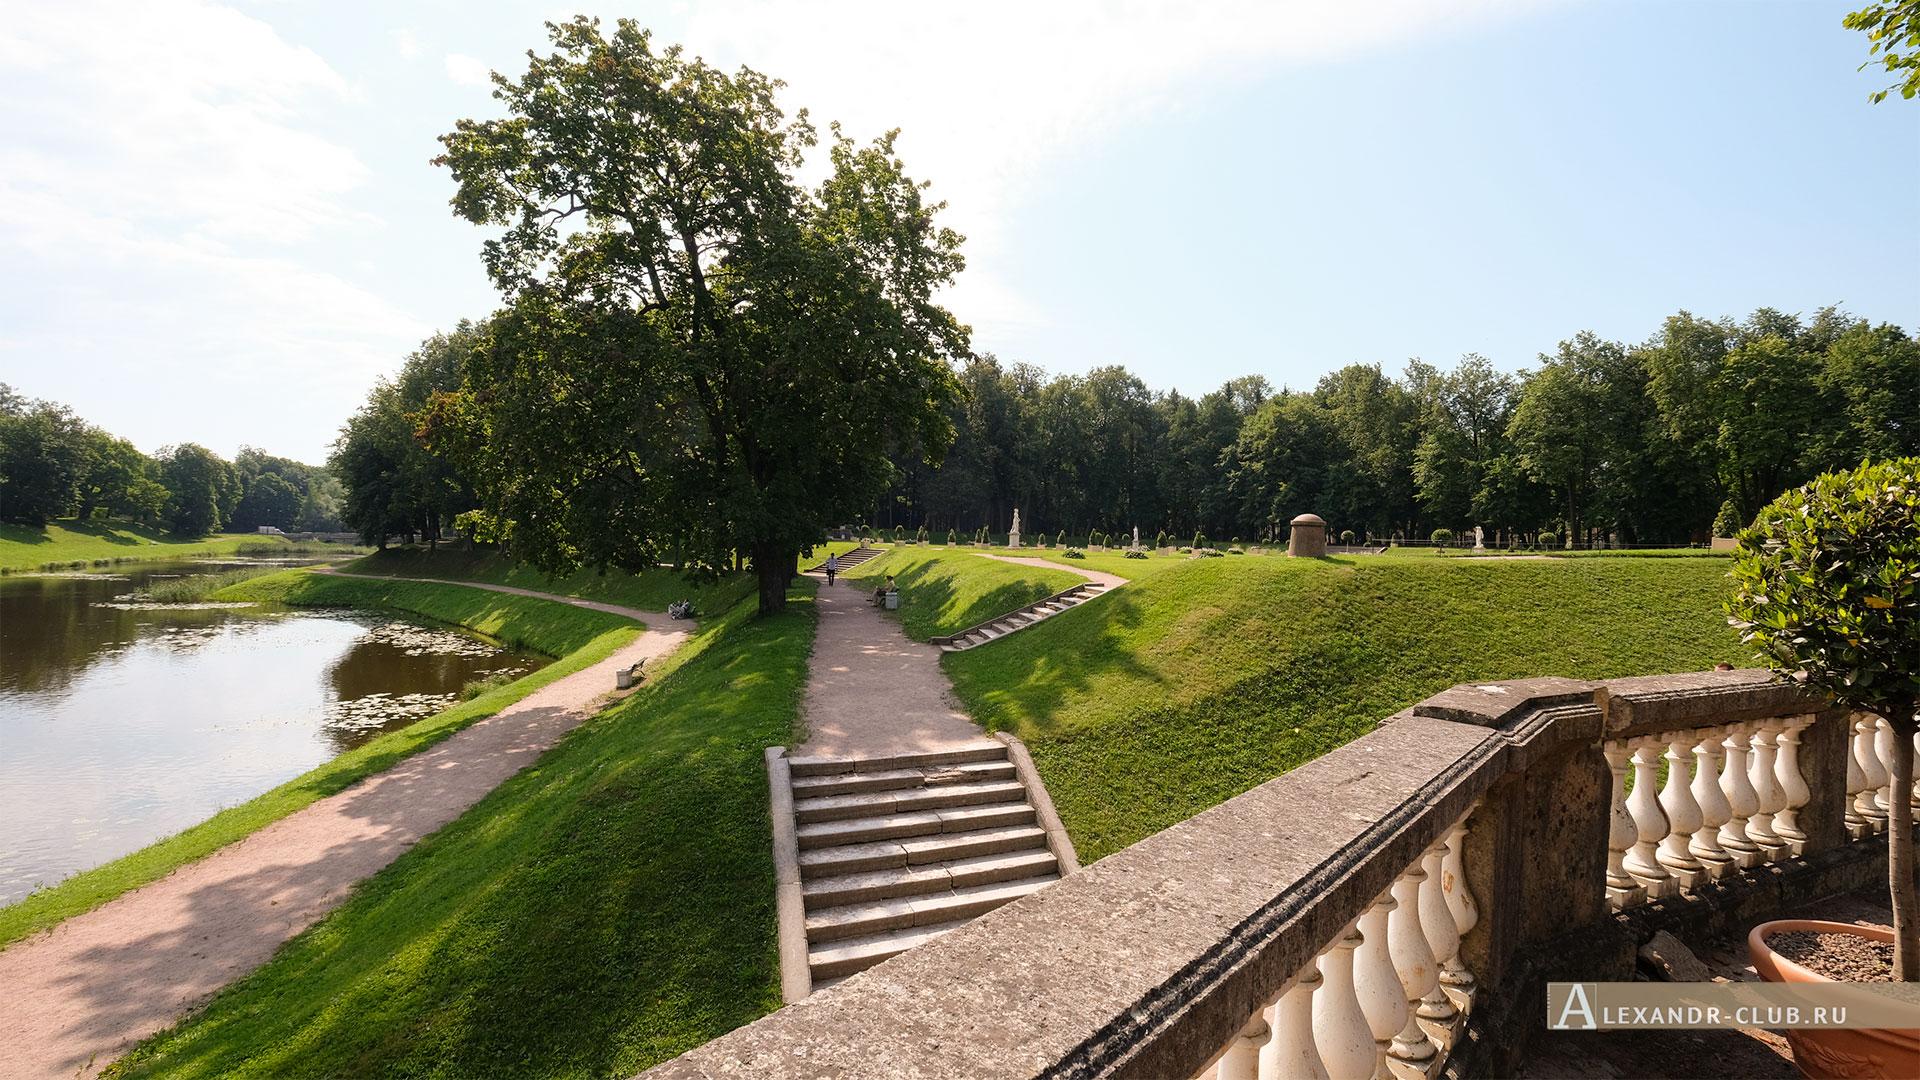 Гатчинский парк, лето, Голландский сад, Карпин пруд